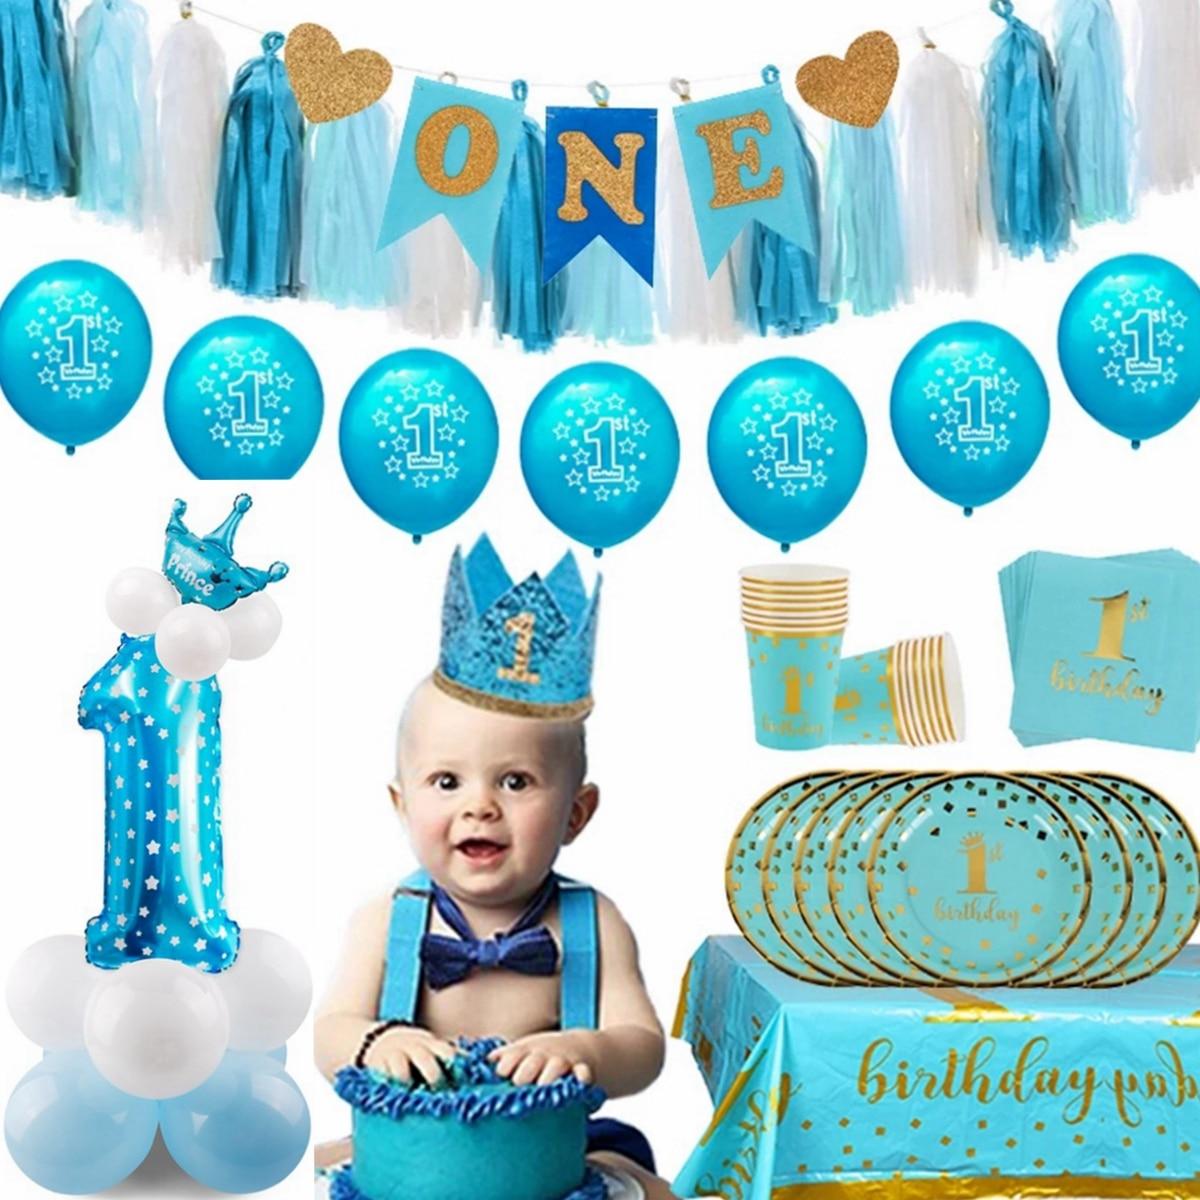 AliExpress - One Year Birthday Boy Baby Shower Birthday Party Decoration 1st Birthday Party Supplies 1 Year Old Crown 1 Birthday Decor